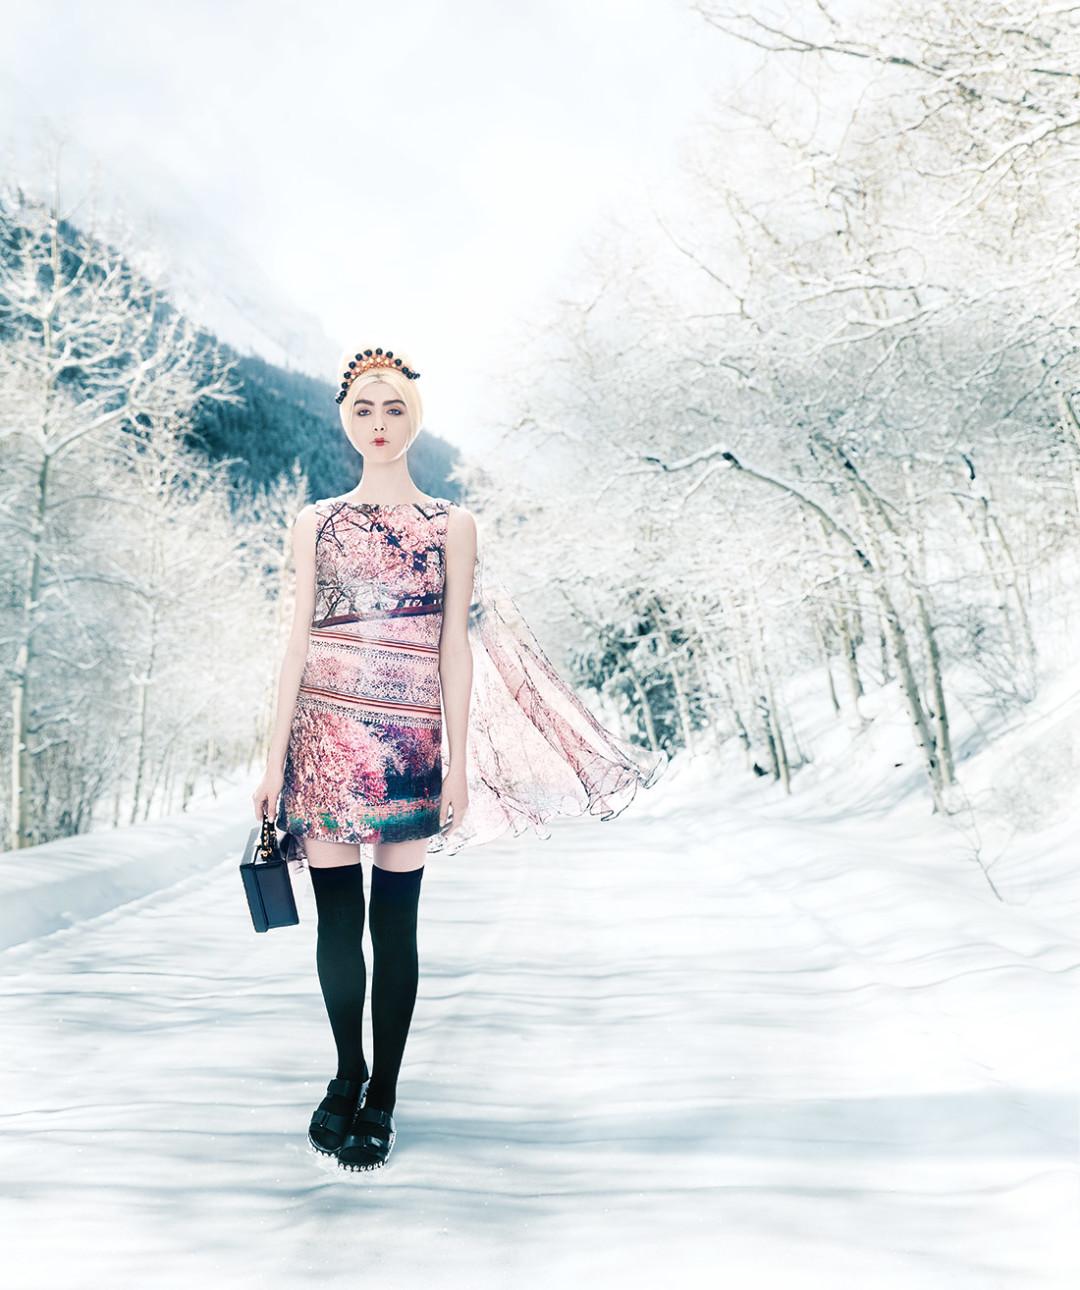 0214 big in japan pink dress wsvzhs